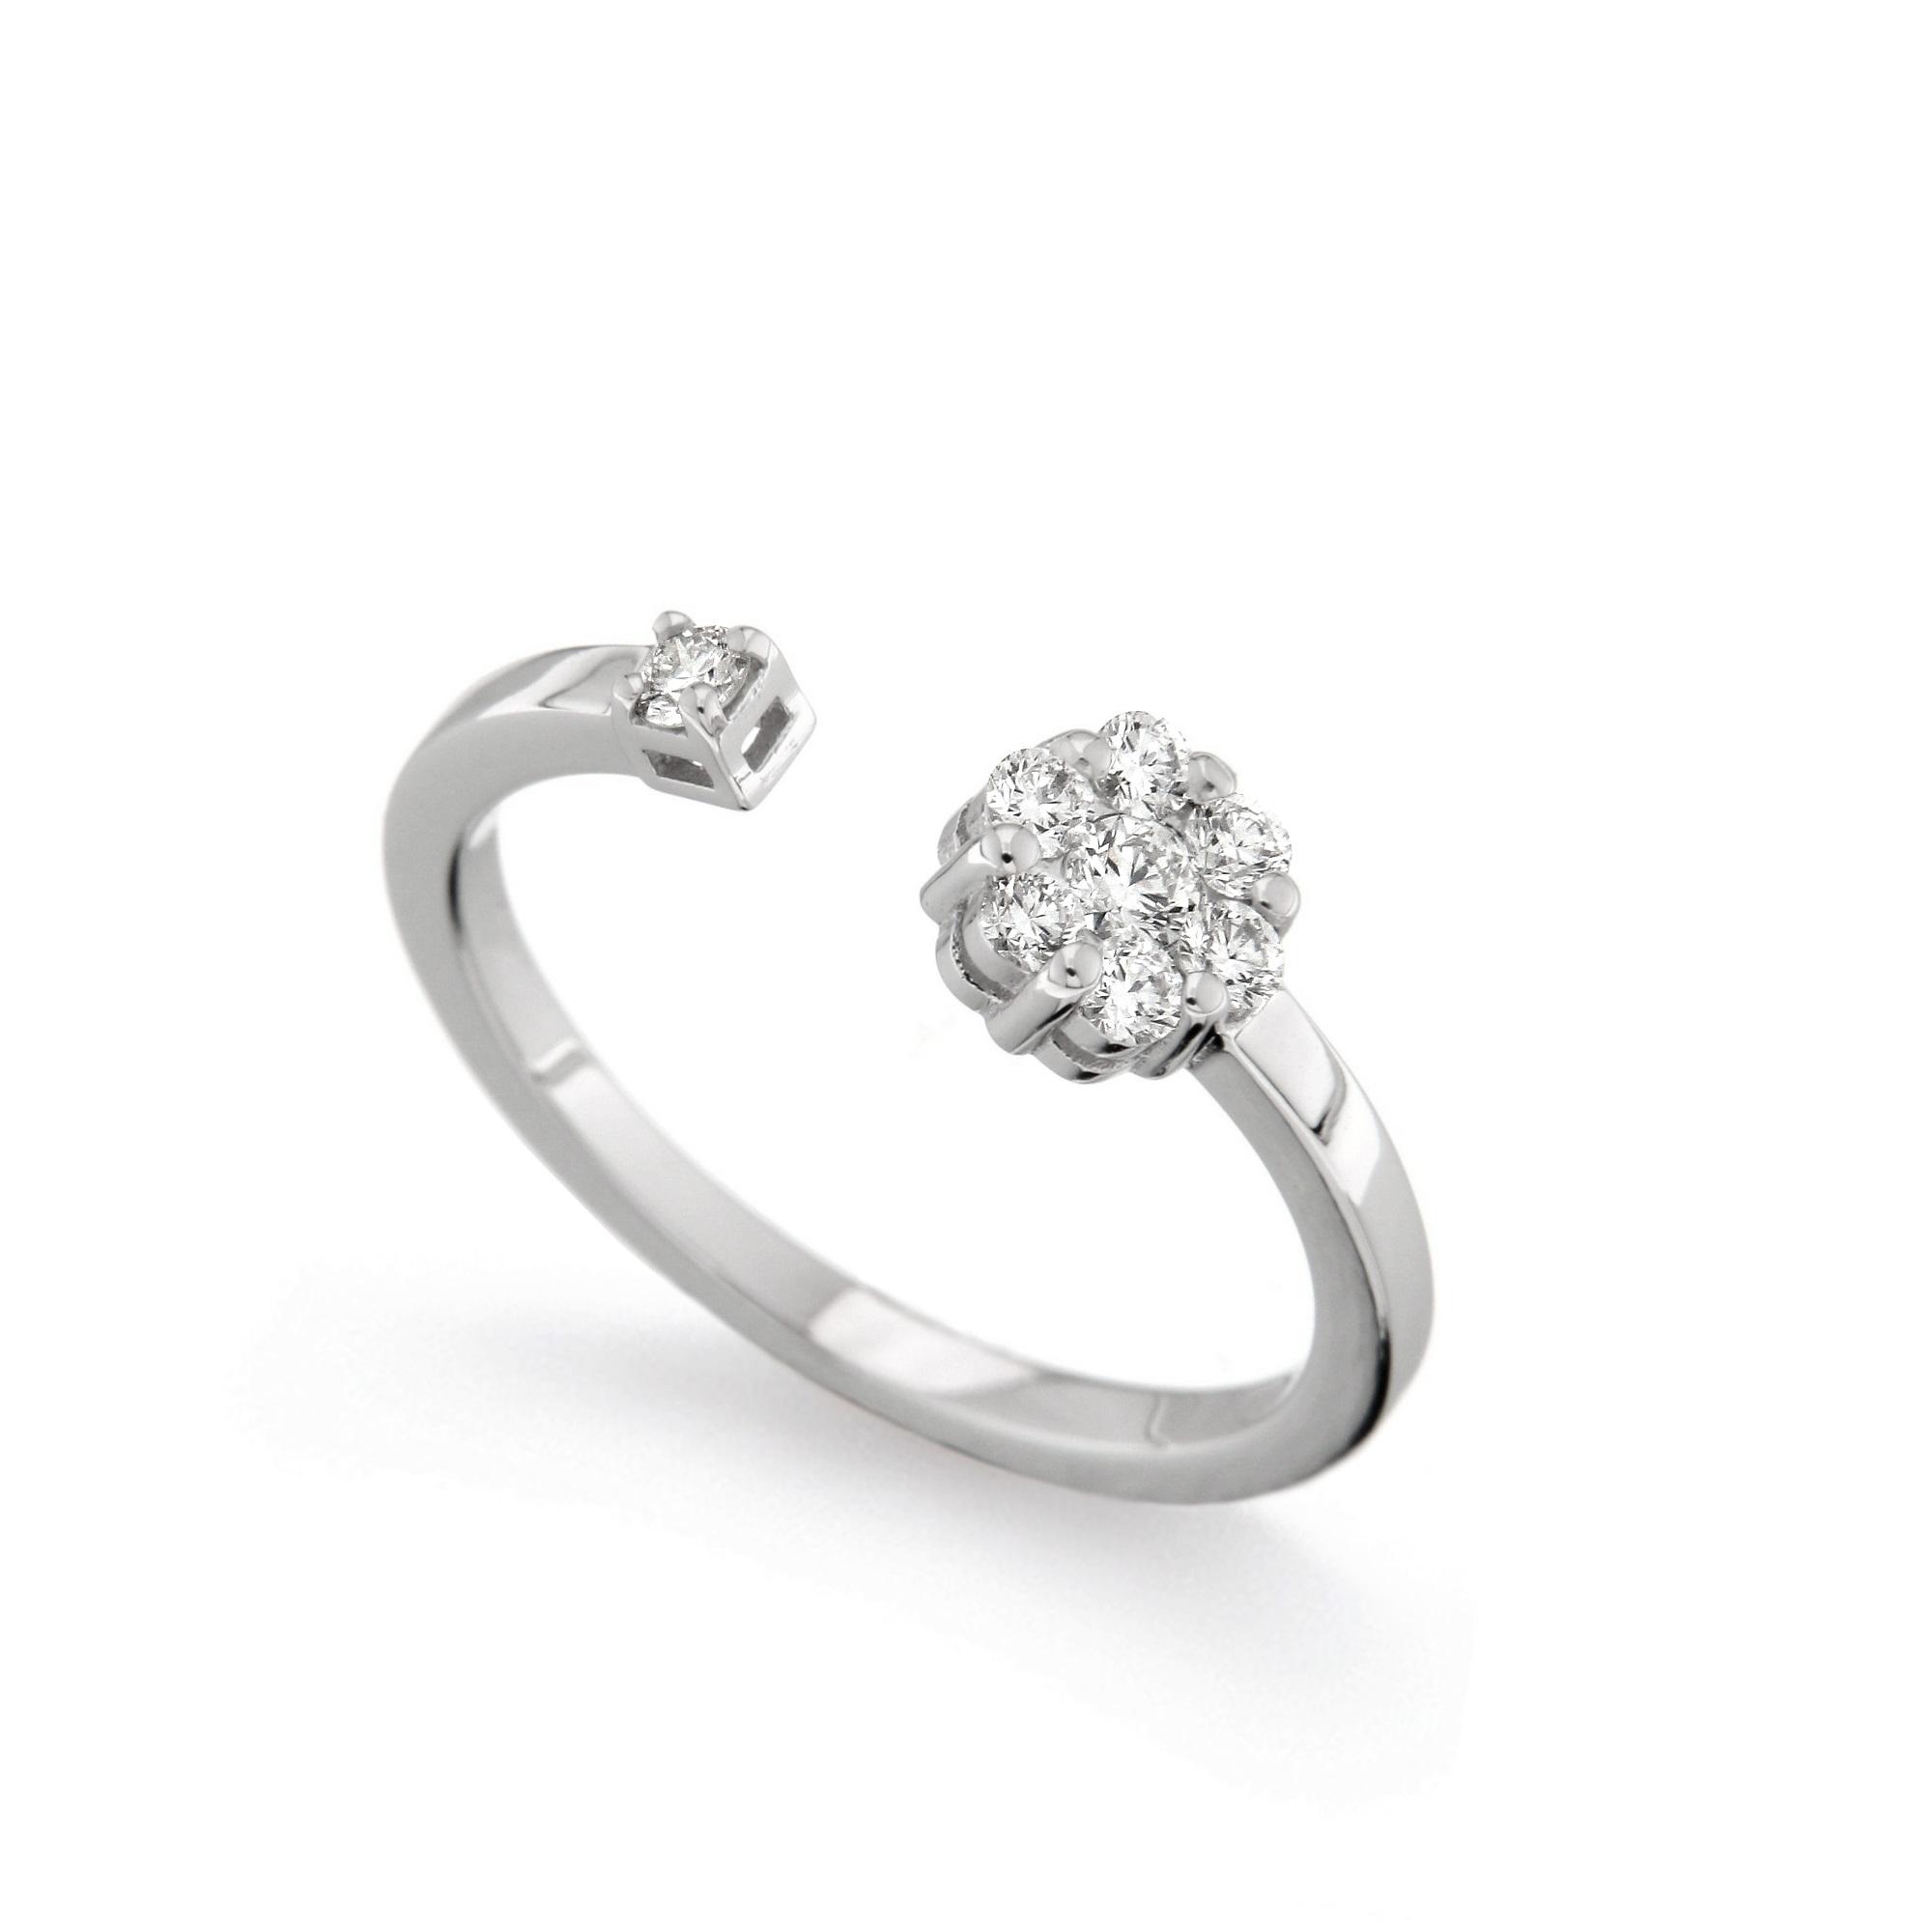 Inel din aur 18K cu diamante 0,28 ct., model Orsini 2724G